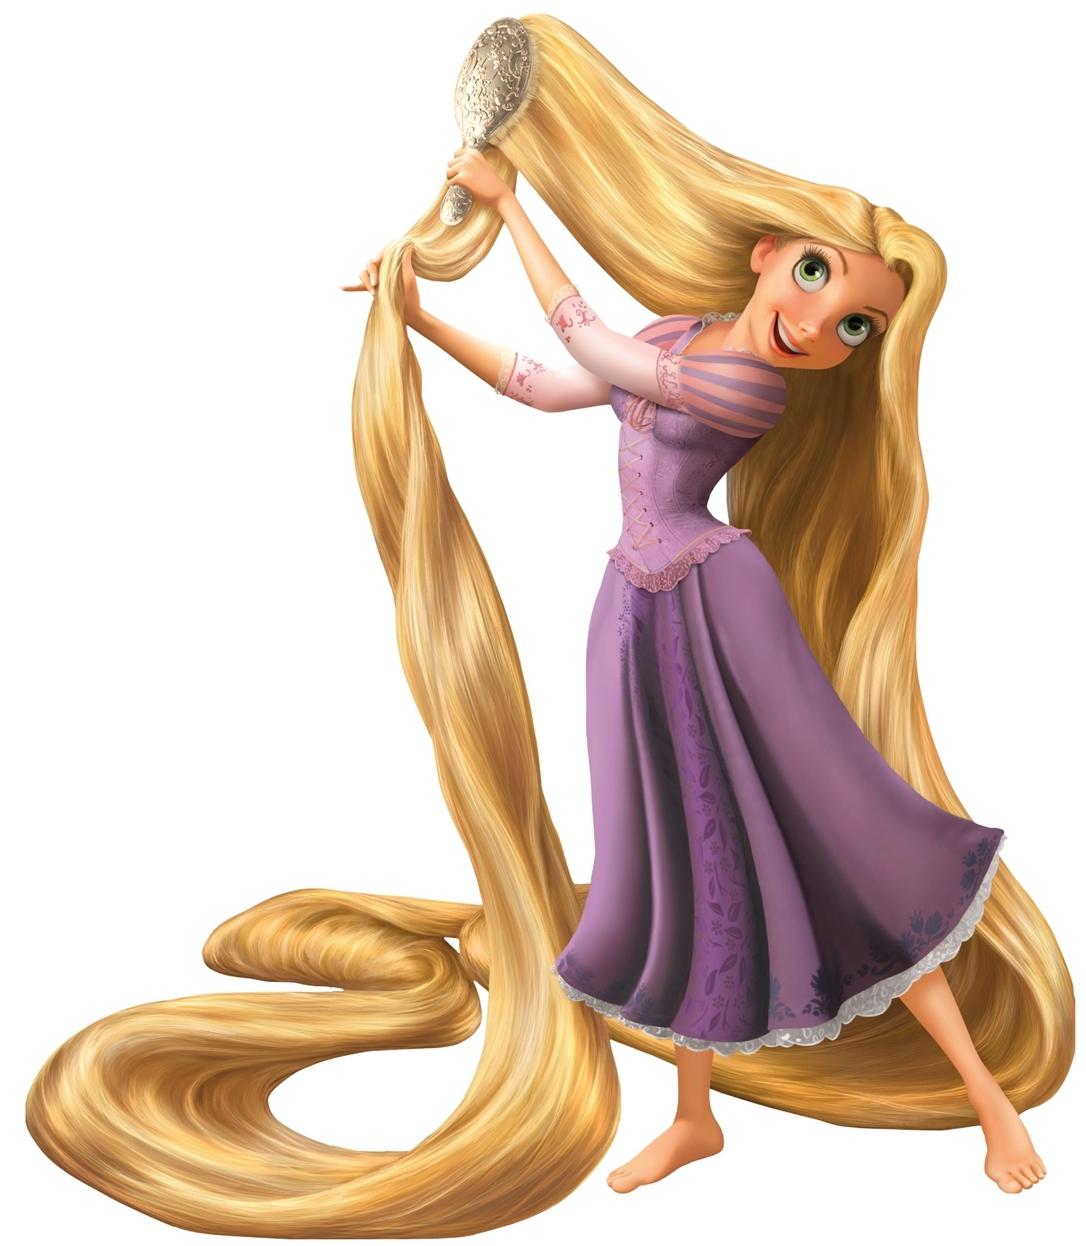 Amazing Rapunzel Pictures & Backgrounds